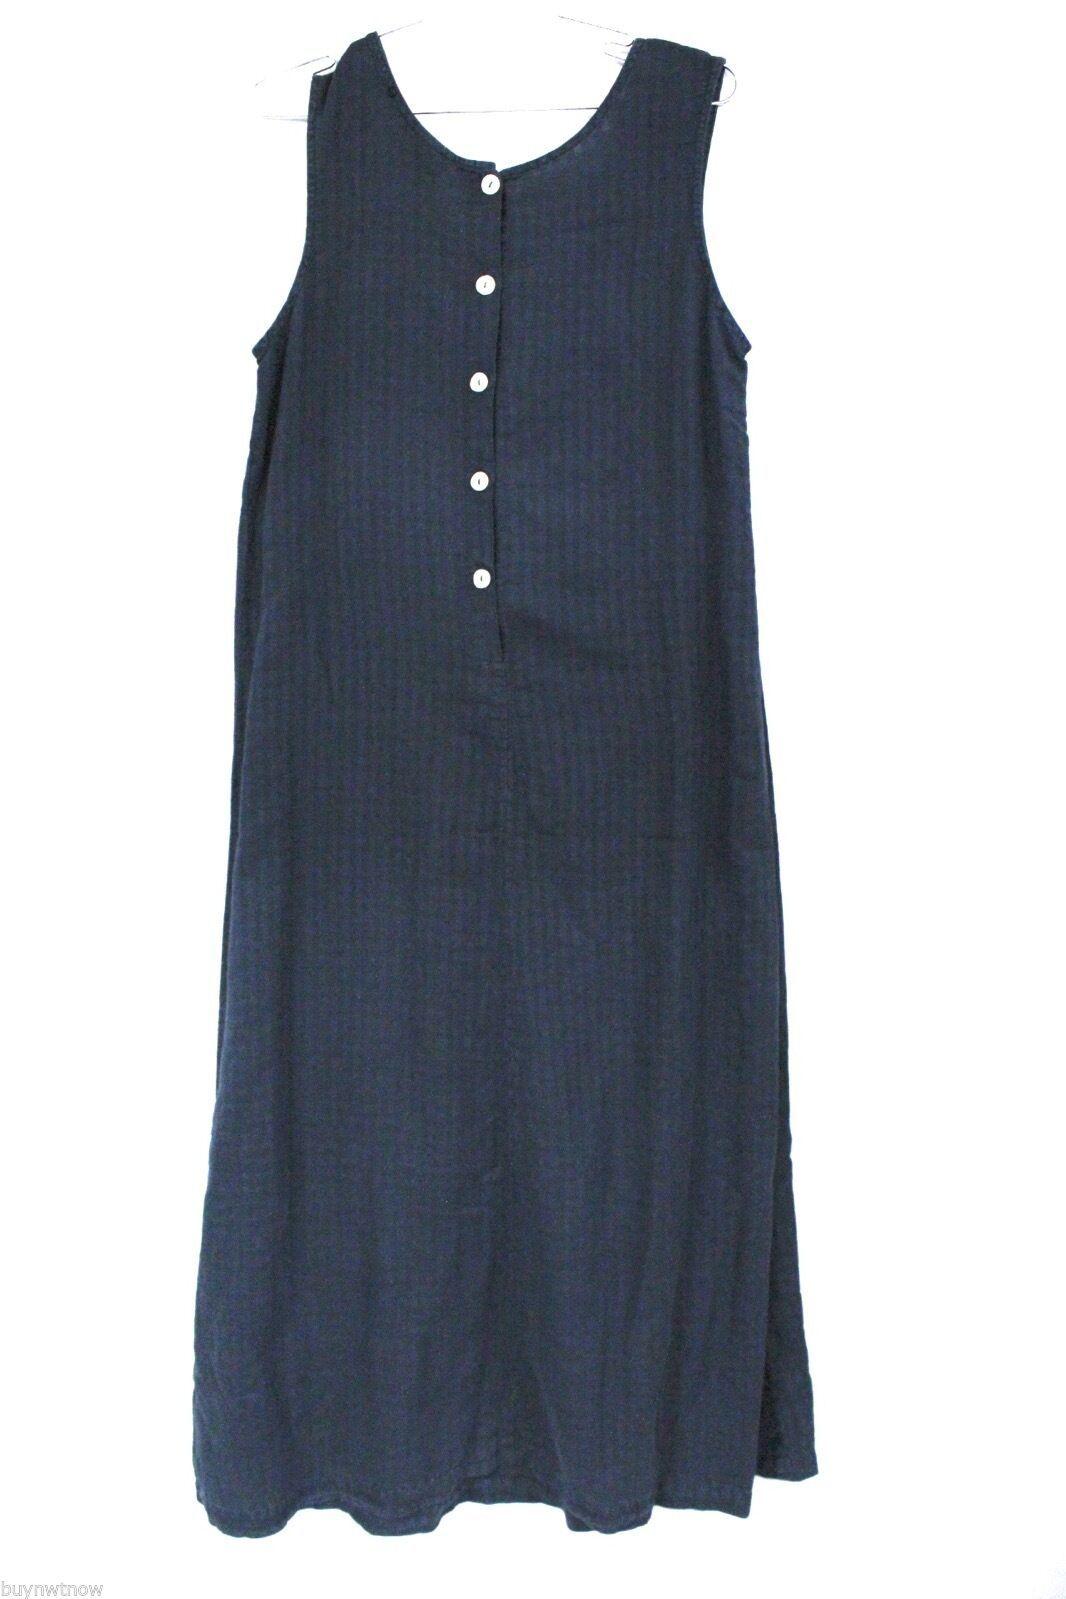 Fresh Produce Tank Maxi Dress & Jacket Blouse Top Black Windowpane Print  M image 4